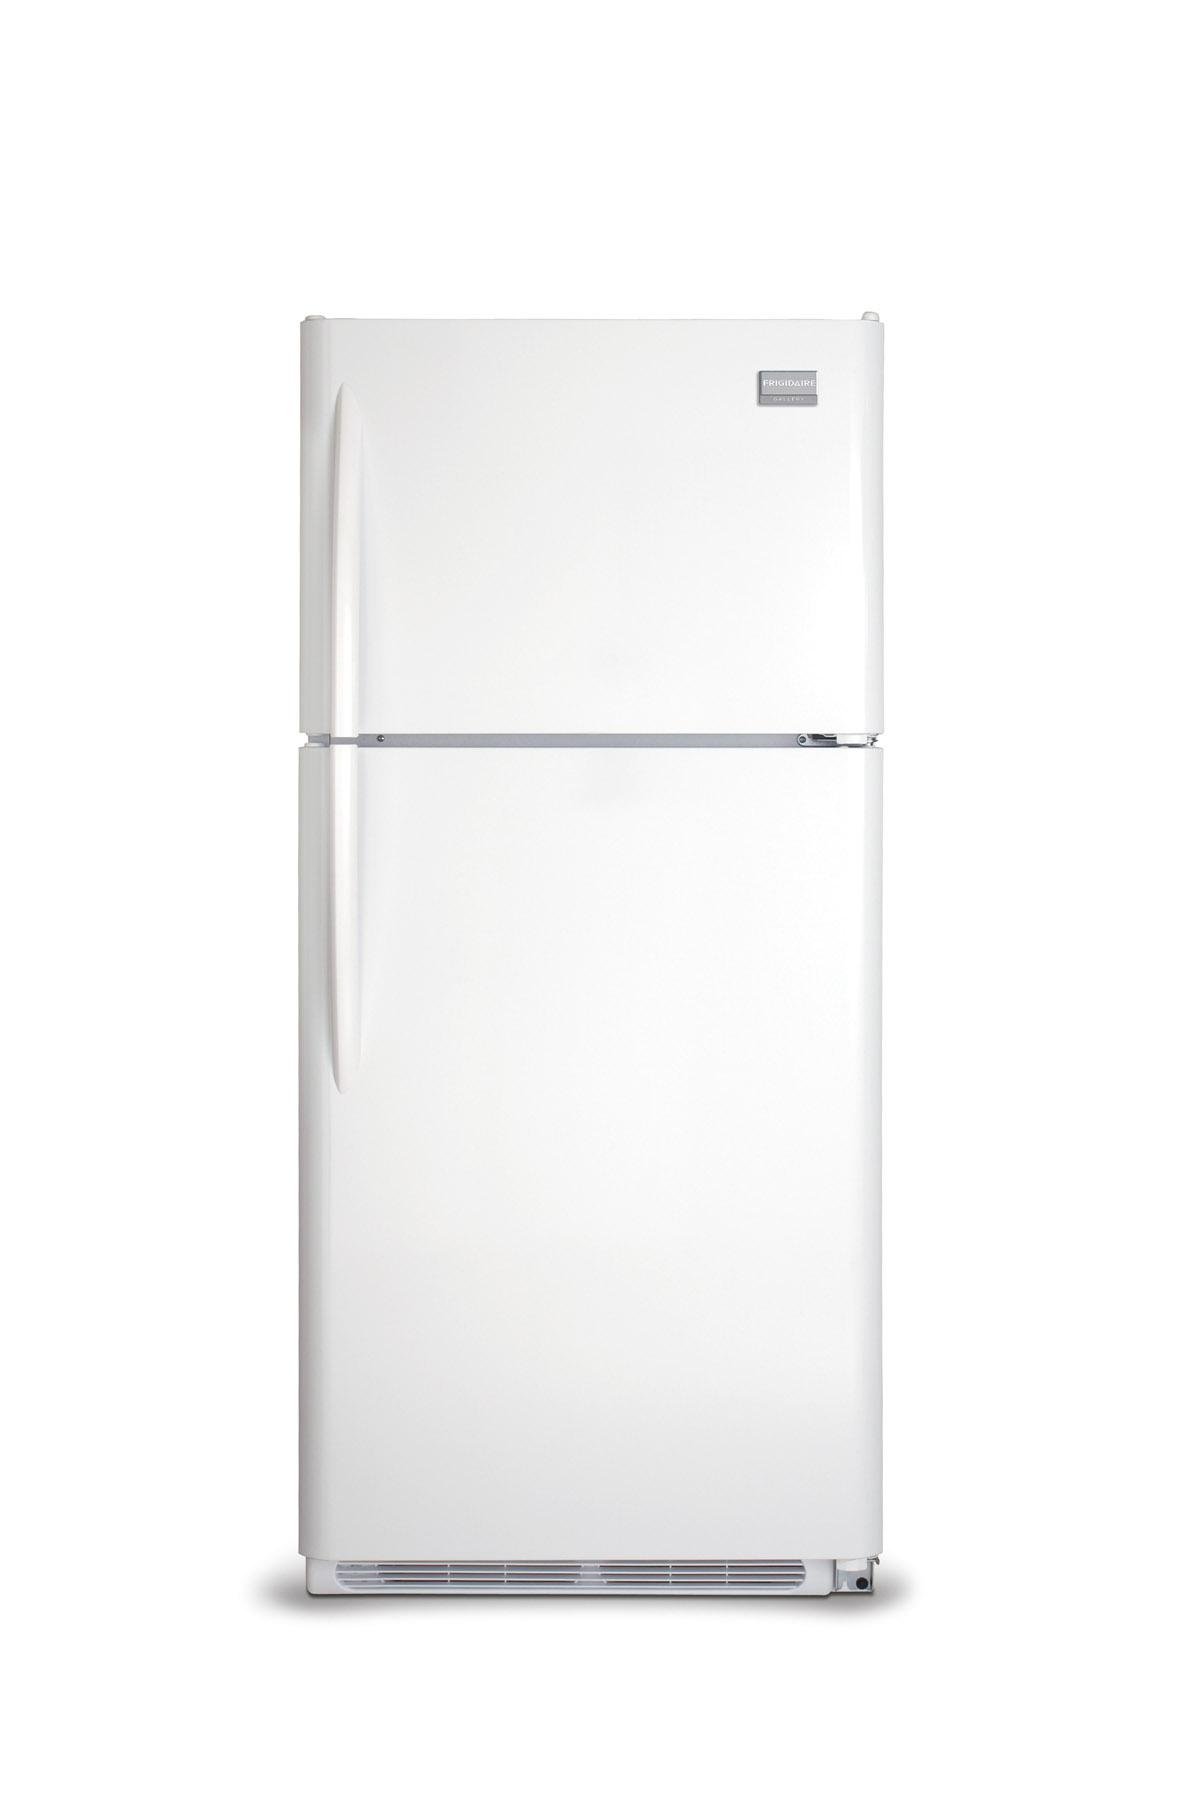 Frigidaire Refrigerator Model FGHT2146KP3 Parts